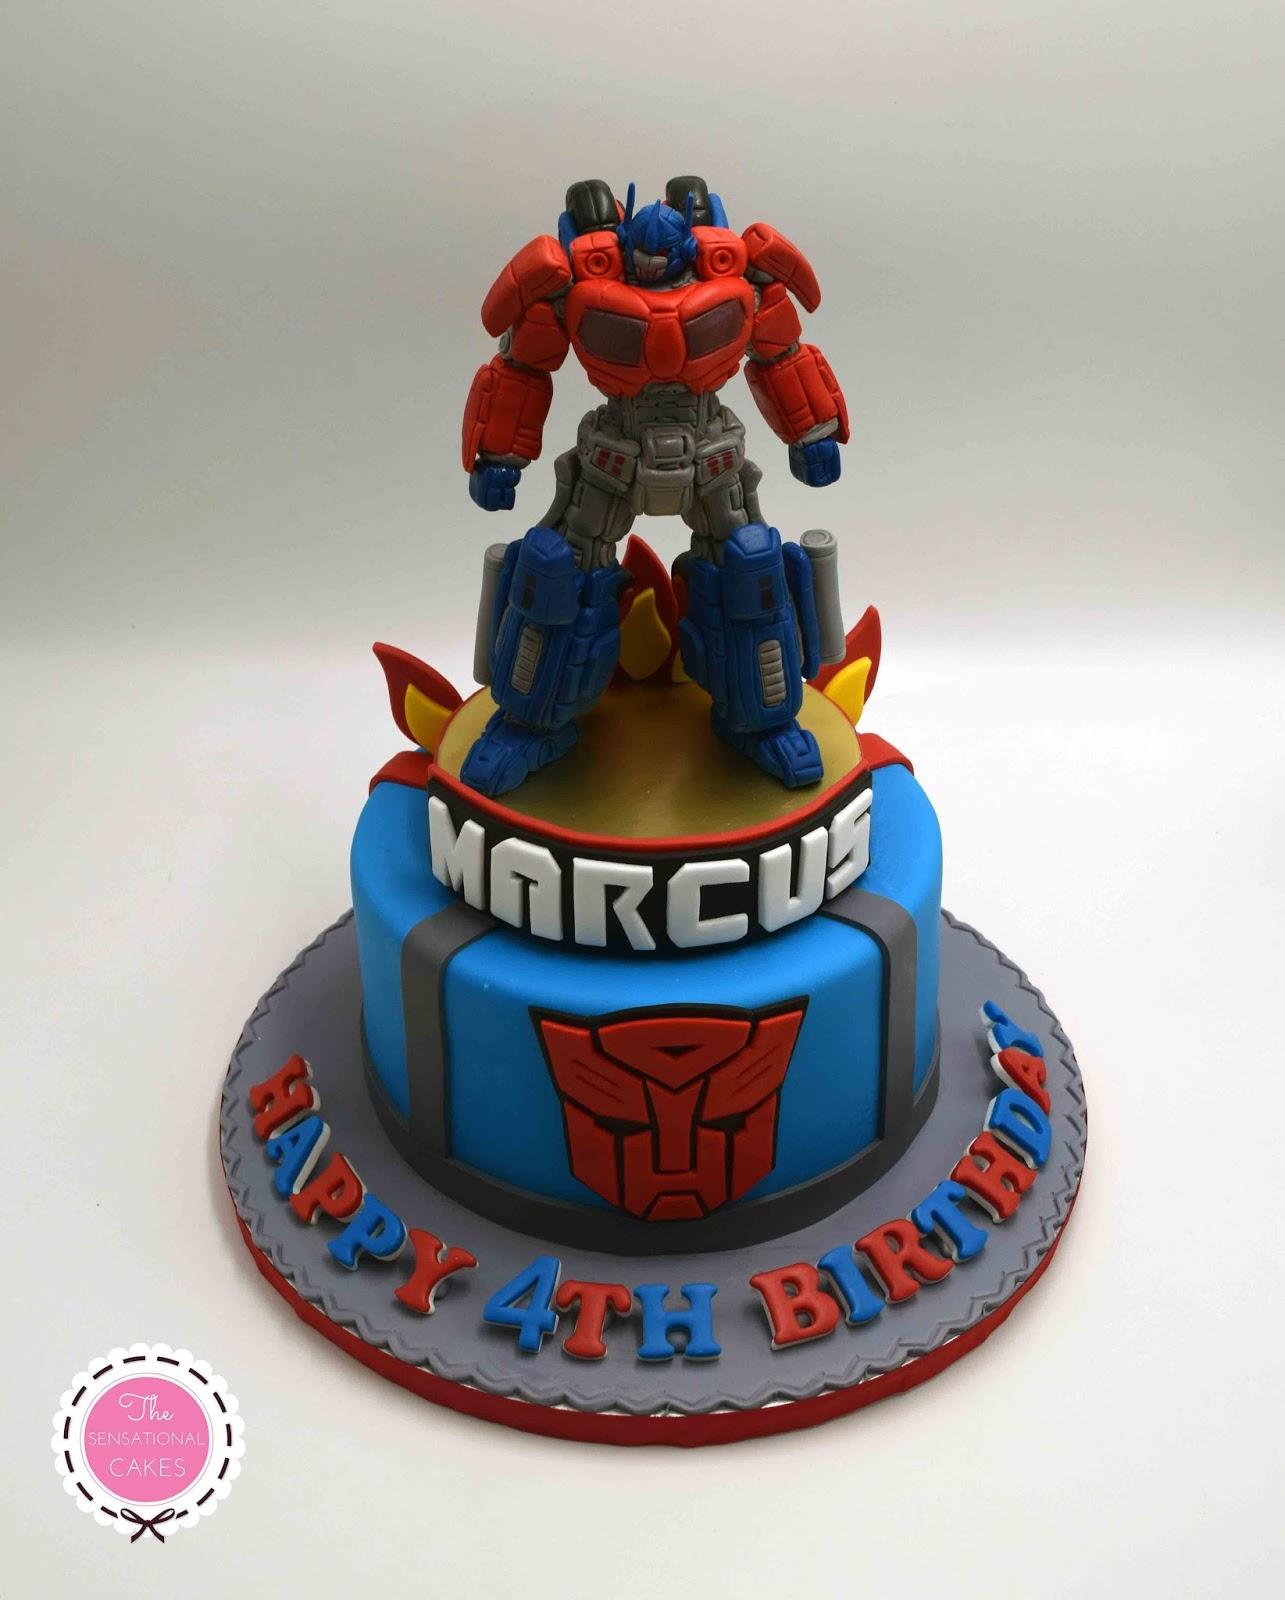 The Sensational Cakes Transformers Concept Birthday Boy Cake 3d